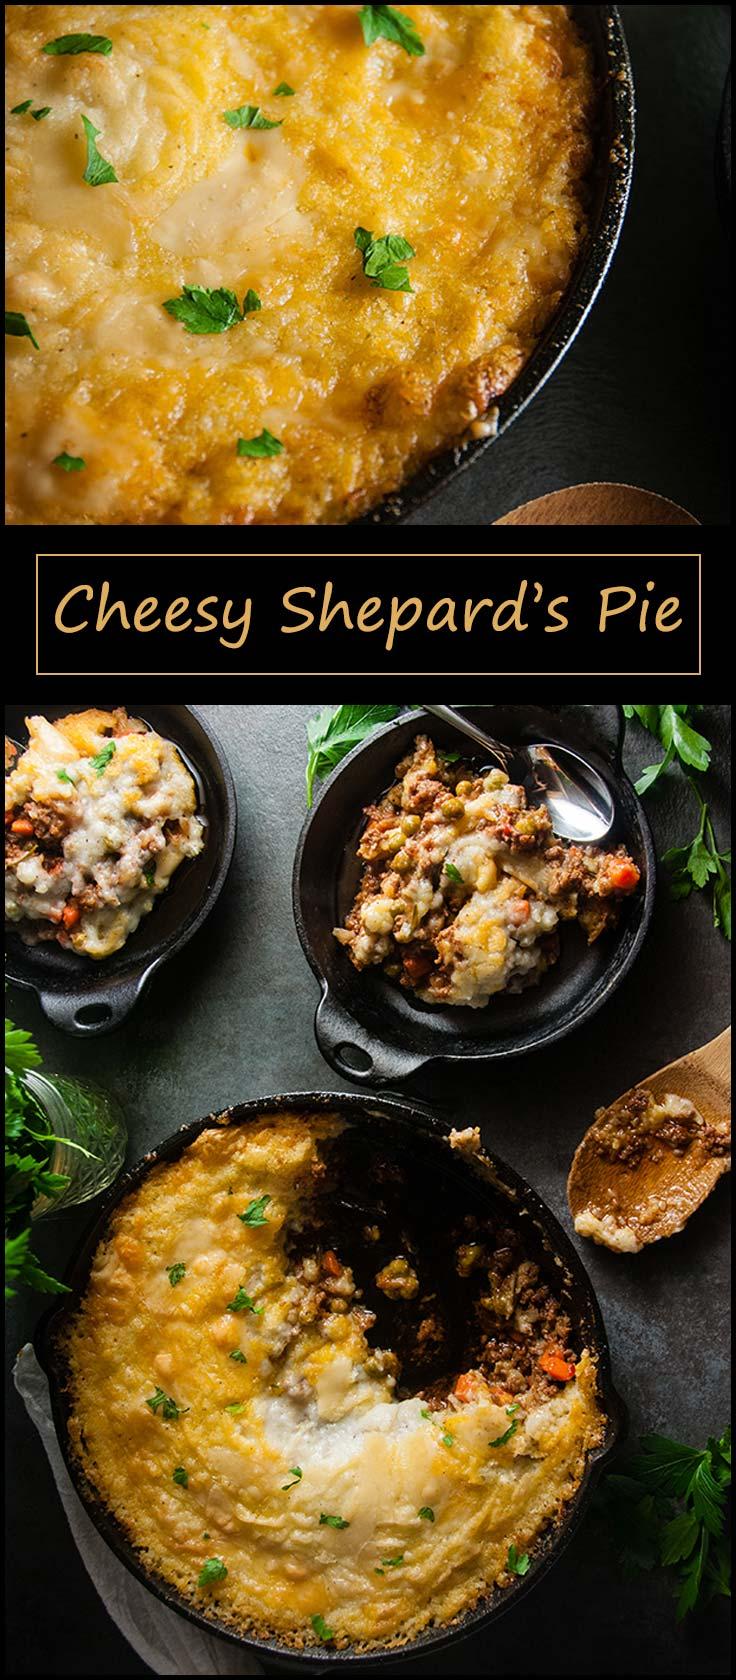 Cheesy Shepard's Pie from www.seasonedsprinkles.com